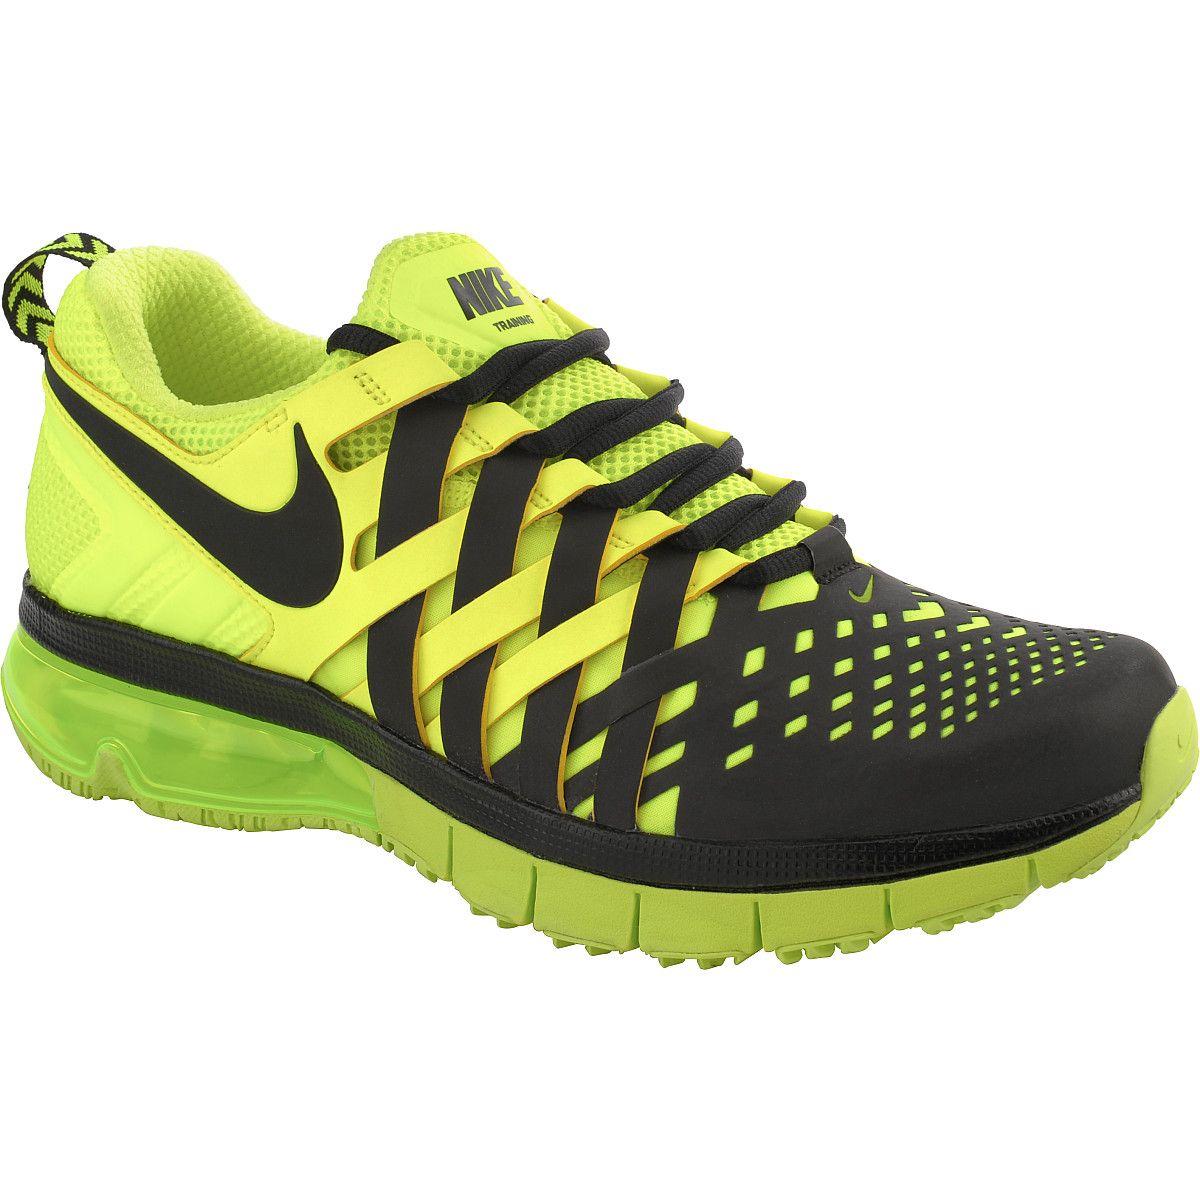 203a2e126ead7 NIKE Men's Fingertrap Max Cross-Training Shoes - SportsAuthority.com ...